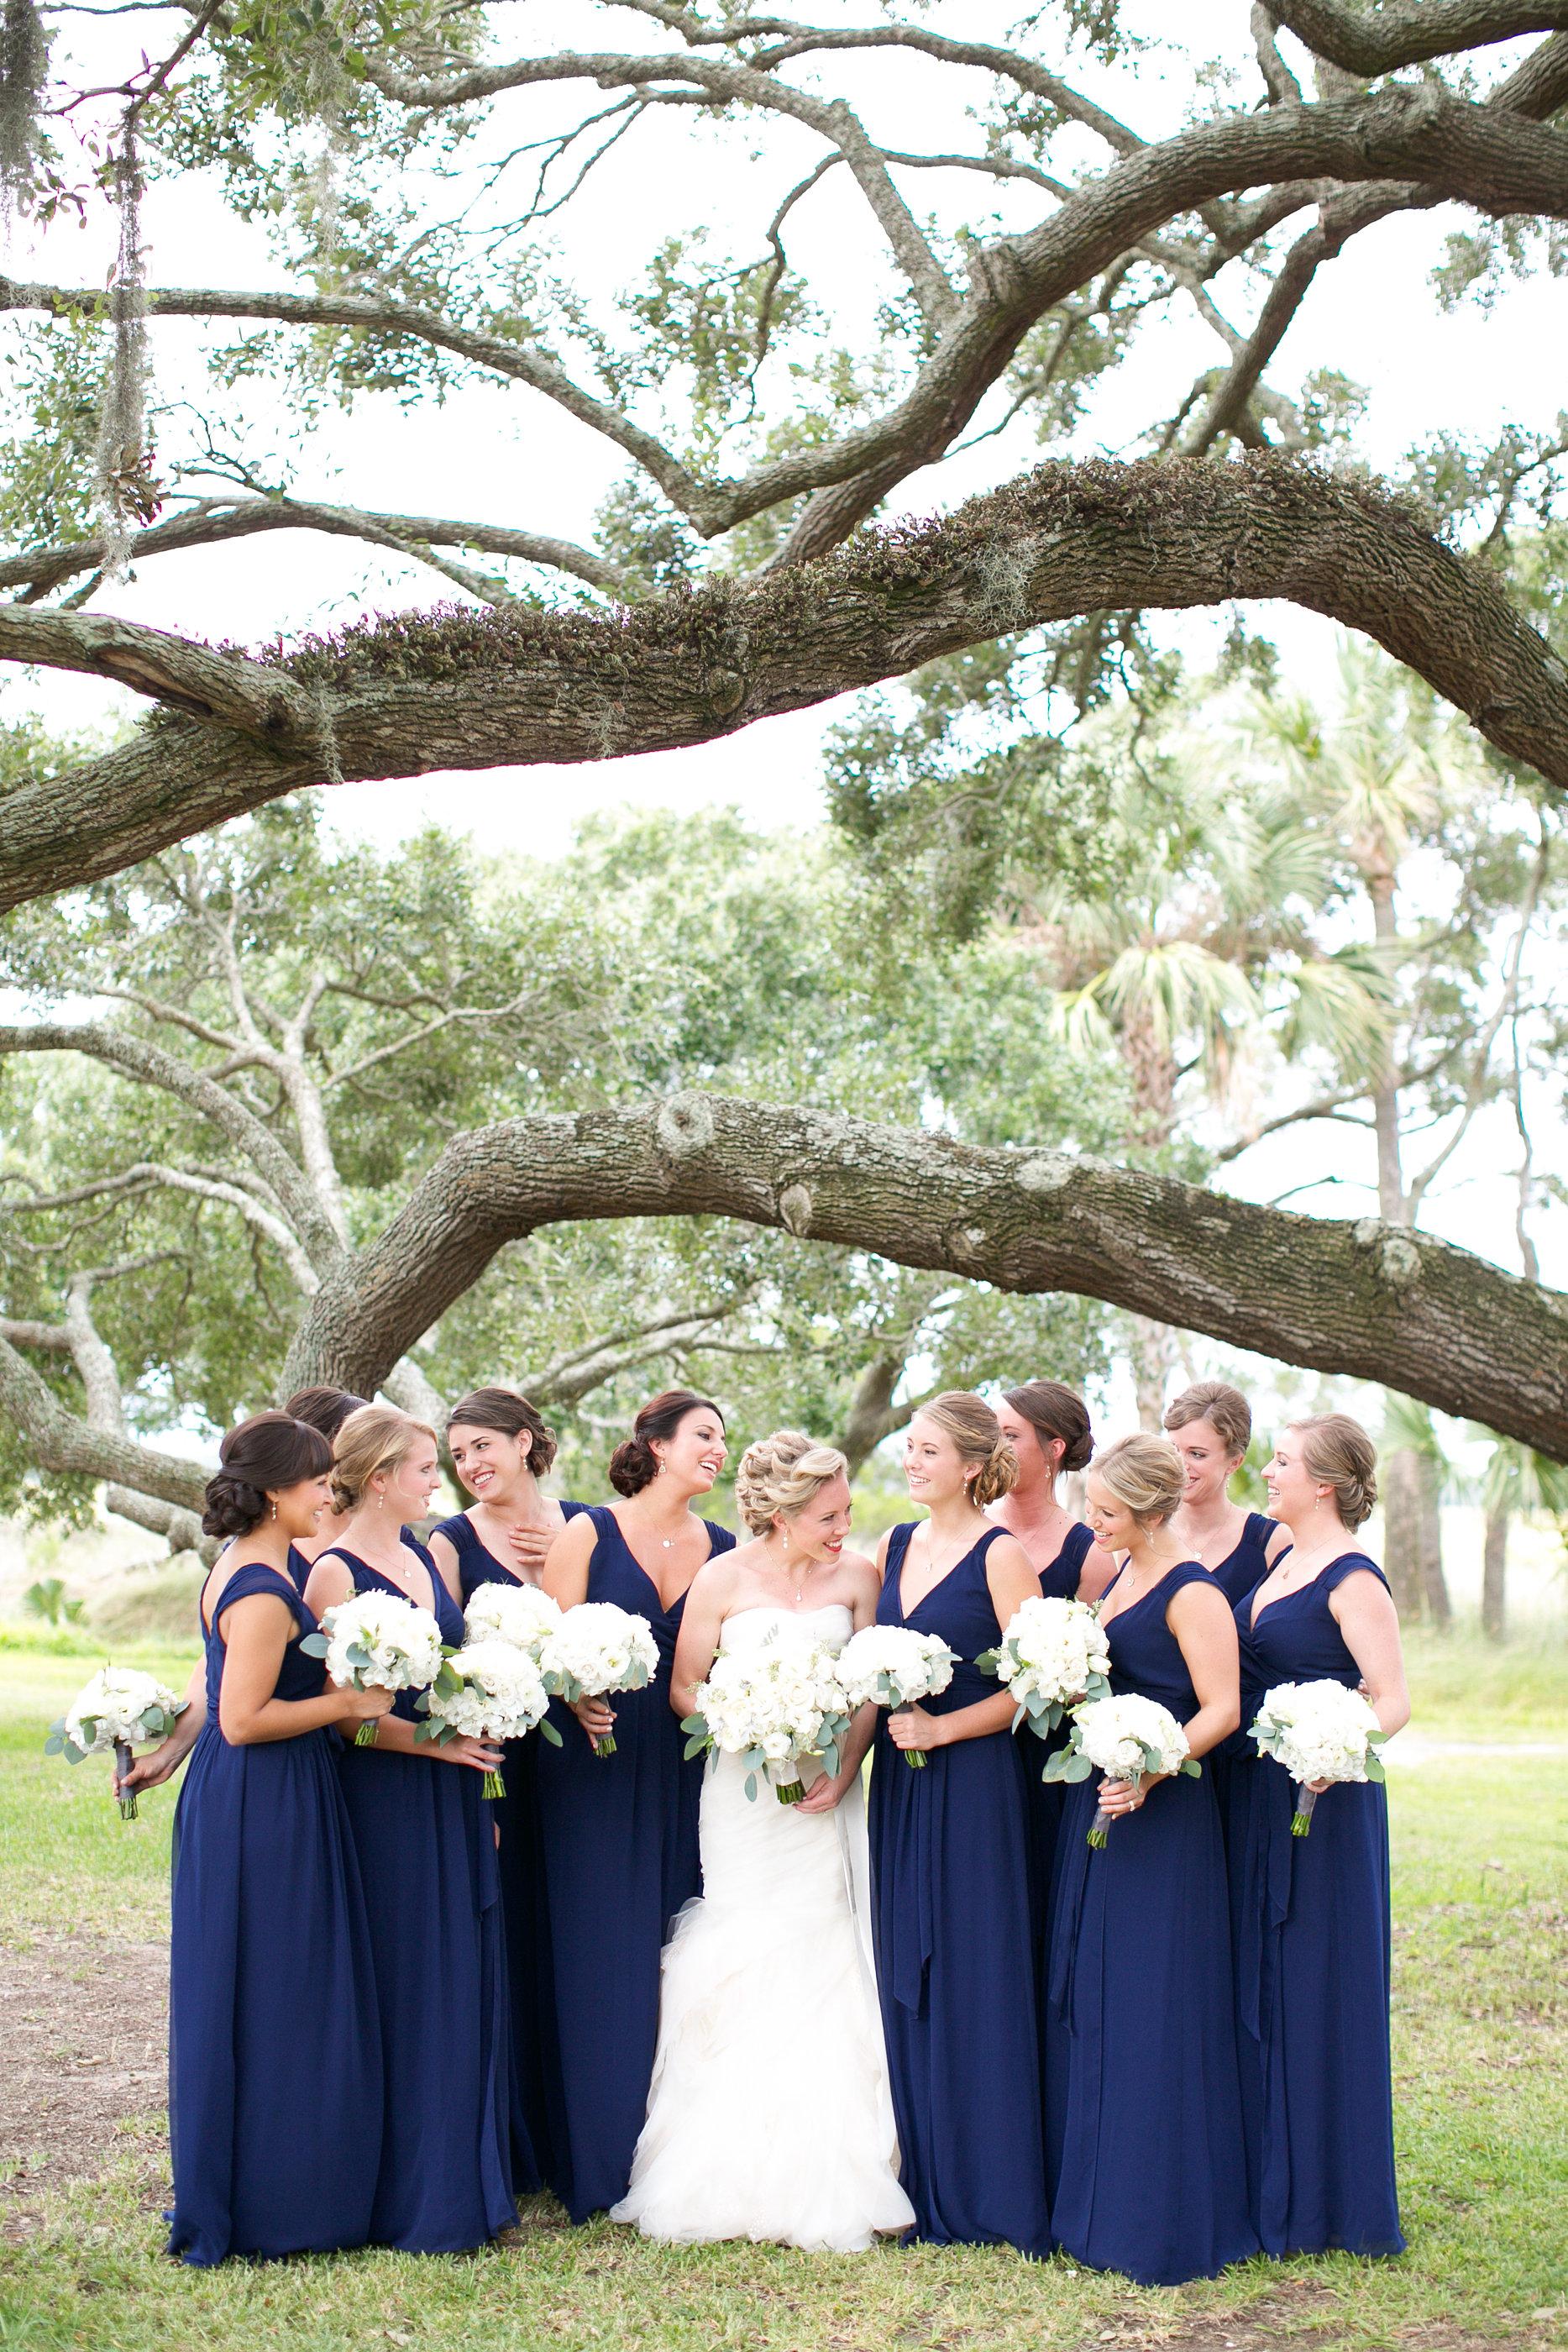 Bridesmaid Details - Kiawah Island, South Carolina - Fall Wedding - Julian Leaver Events